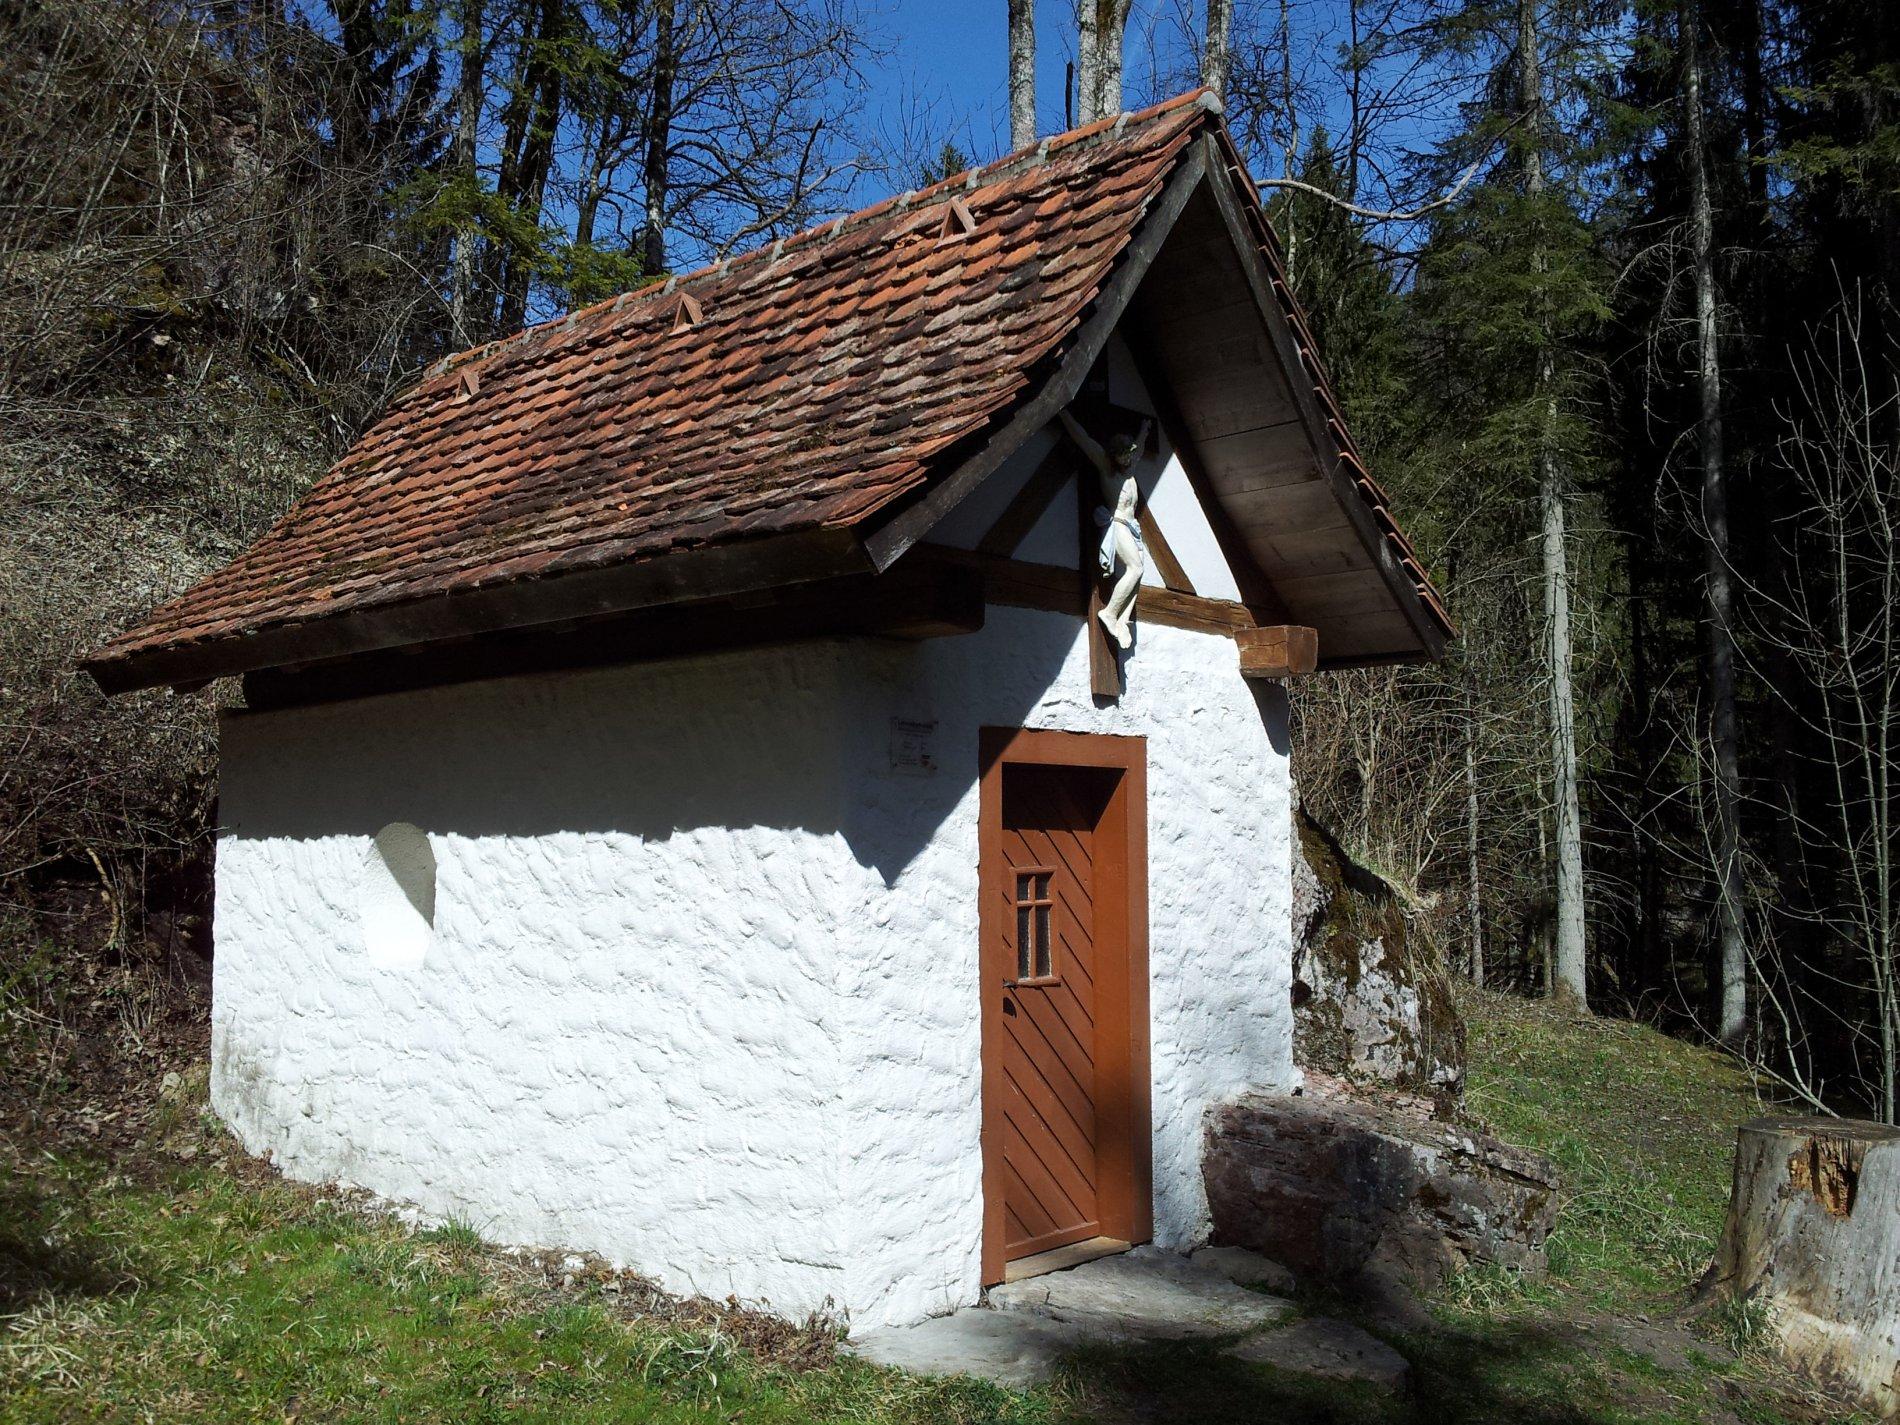 Lochmühlenkapelle